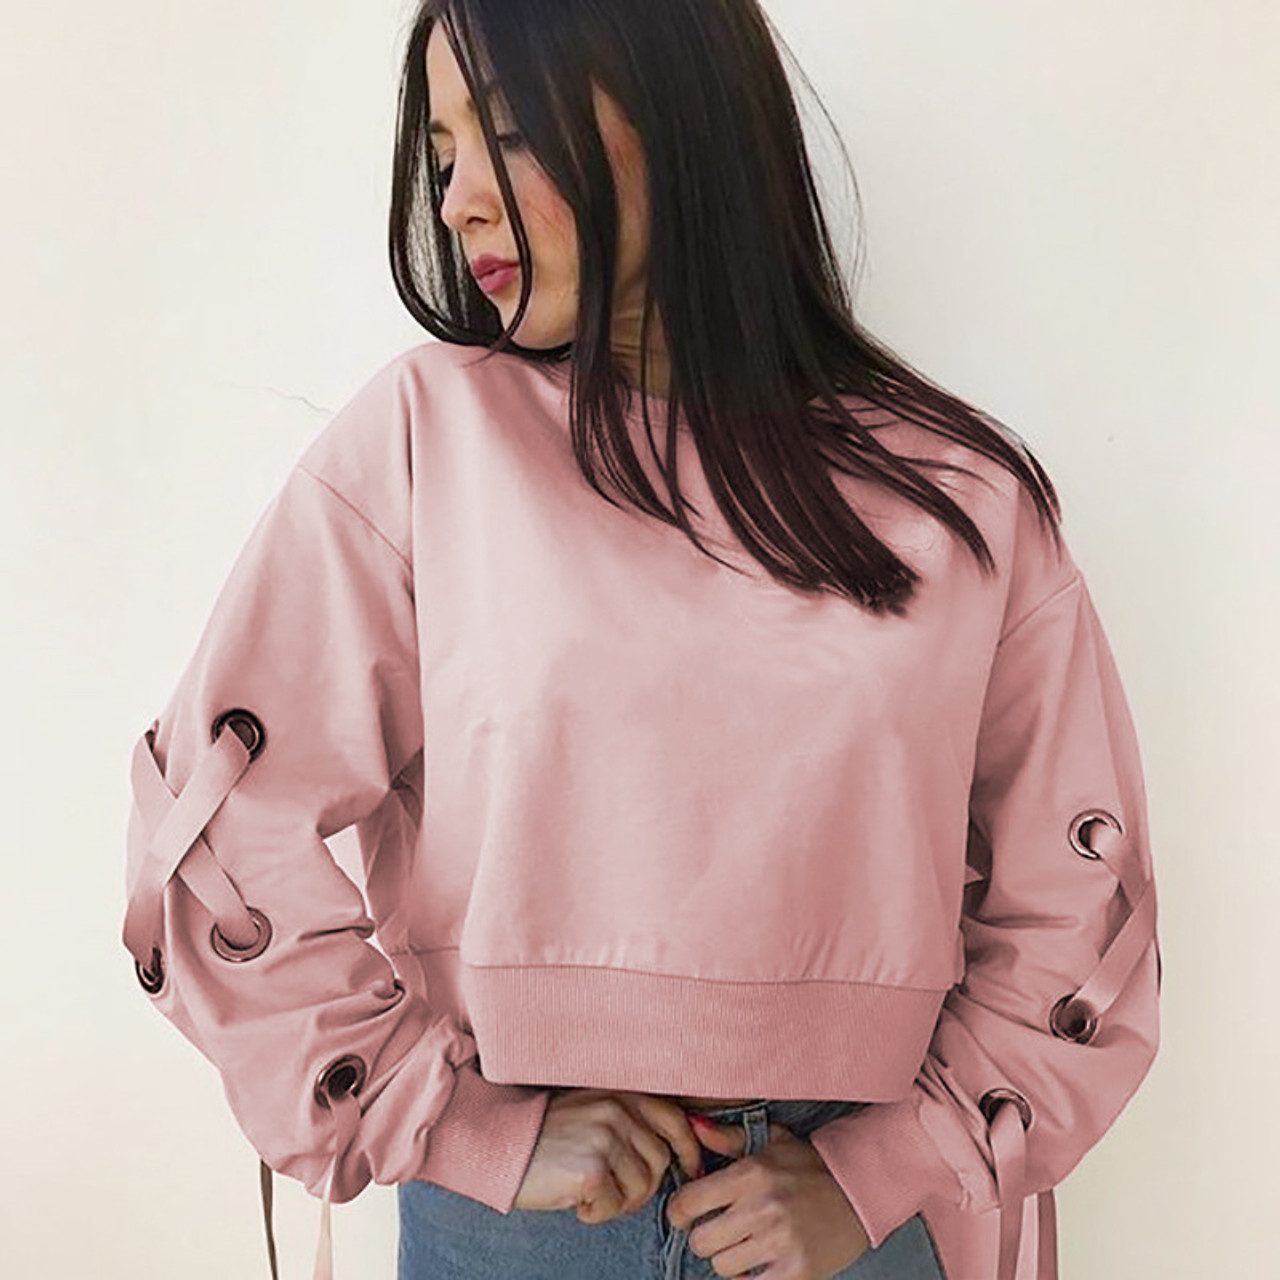 2a8e4bd76b2 pink hoodie lace up cropped sweatshirts - PALACEFCHIC